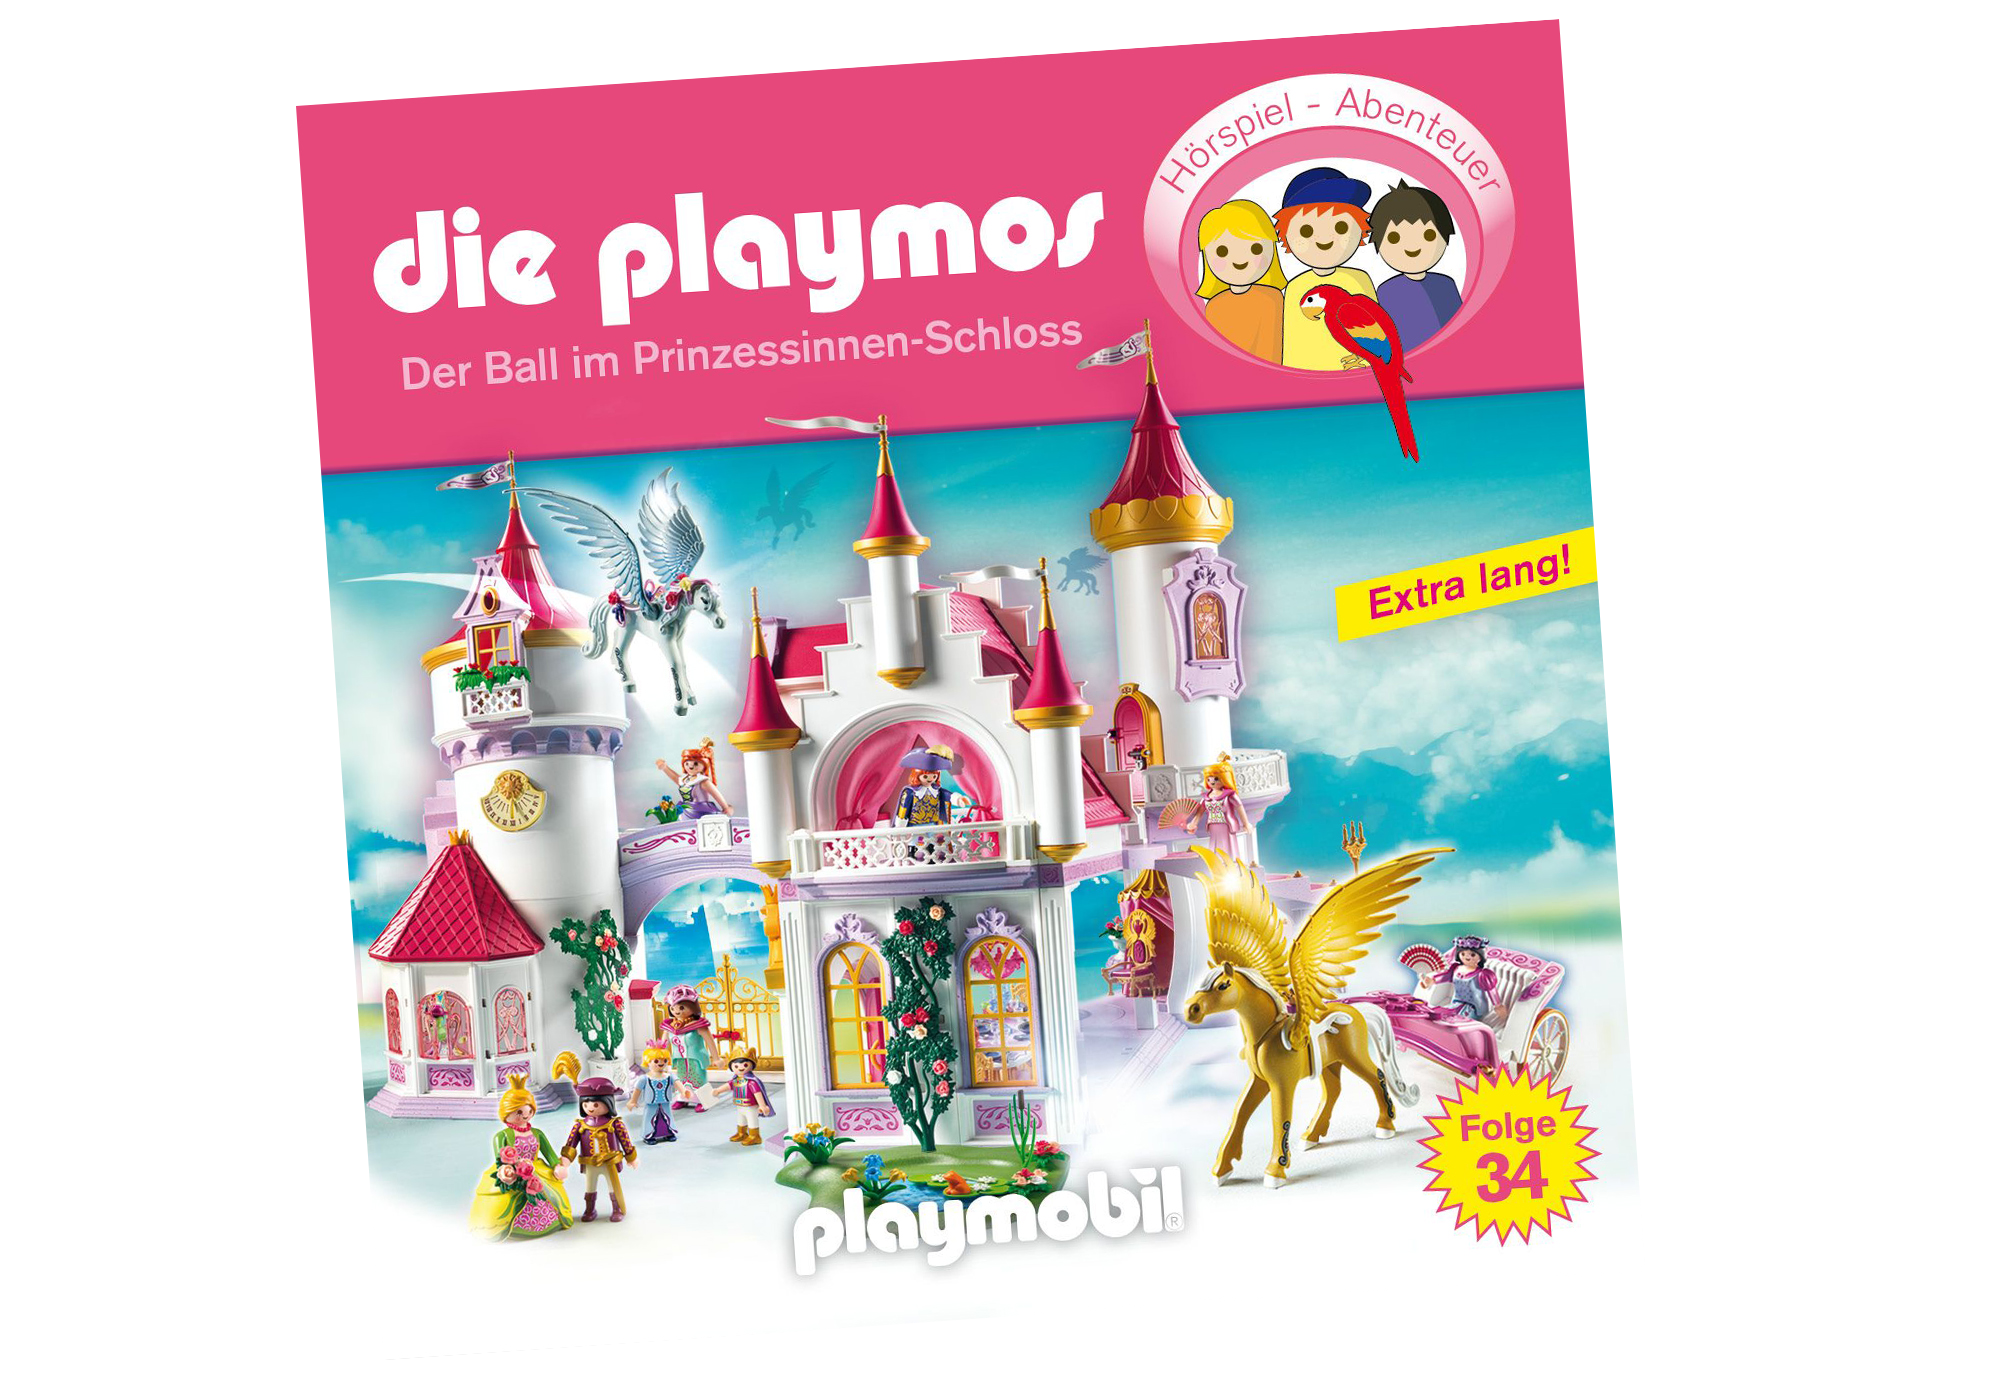 http://media.playmobil.com/i/playmobil/80445_product_detail